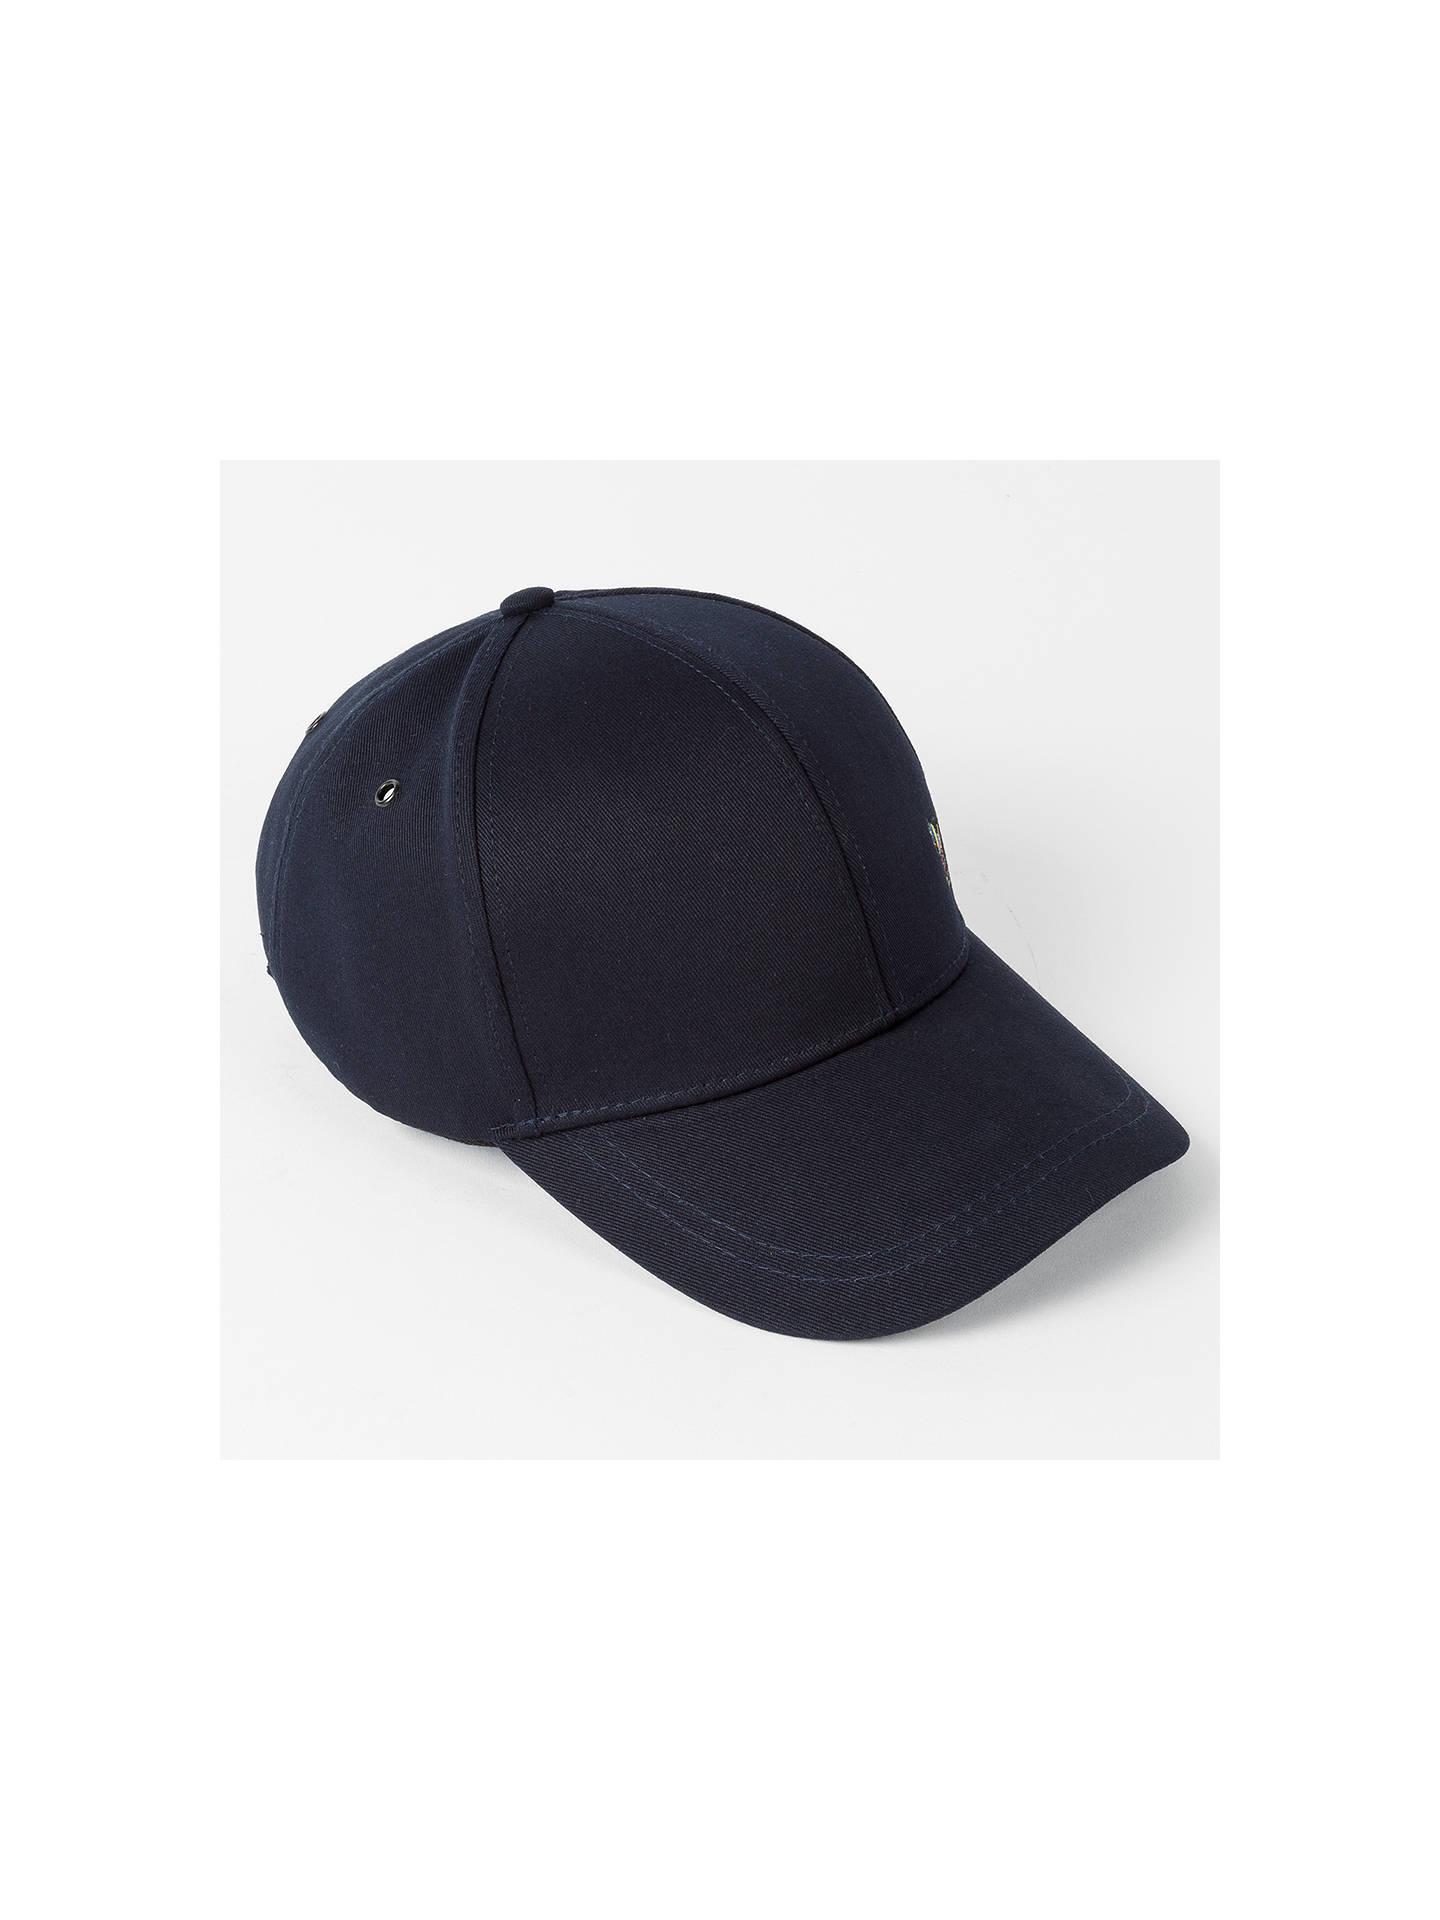 4a9db2e3713ba0 ... Buy Paul Smith Zebra Baseball Cap, One Size, Navy Online at  johnlewis.com ...